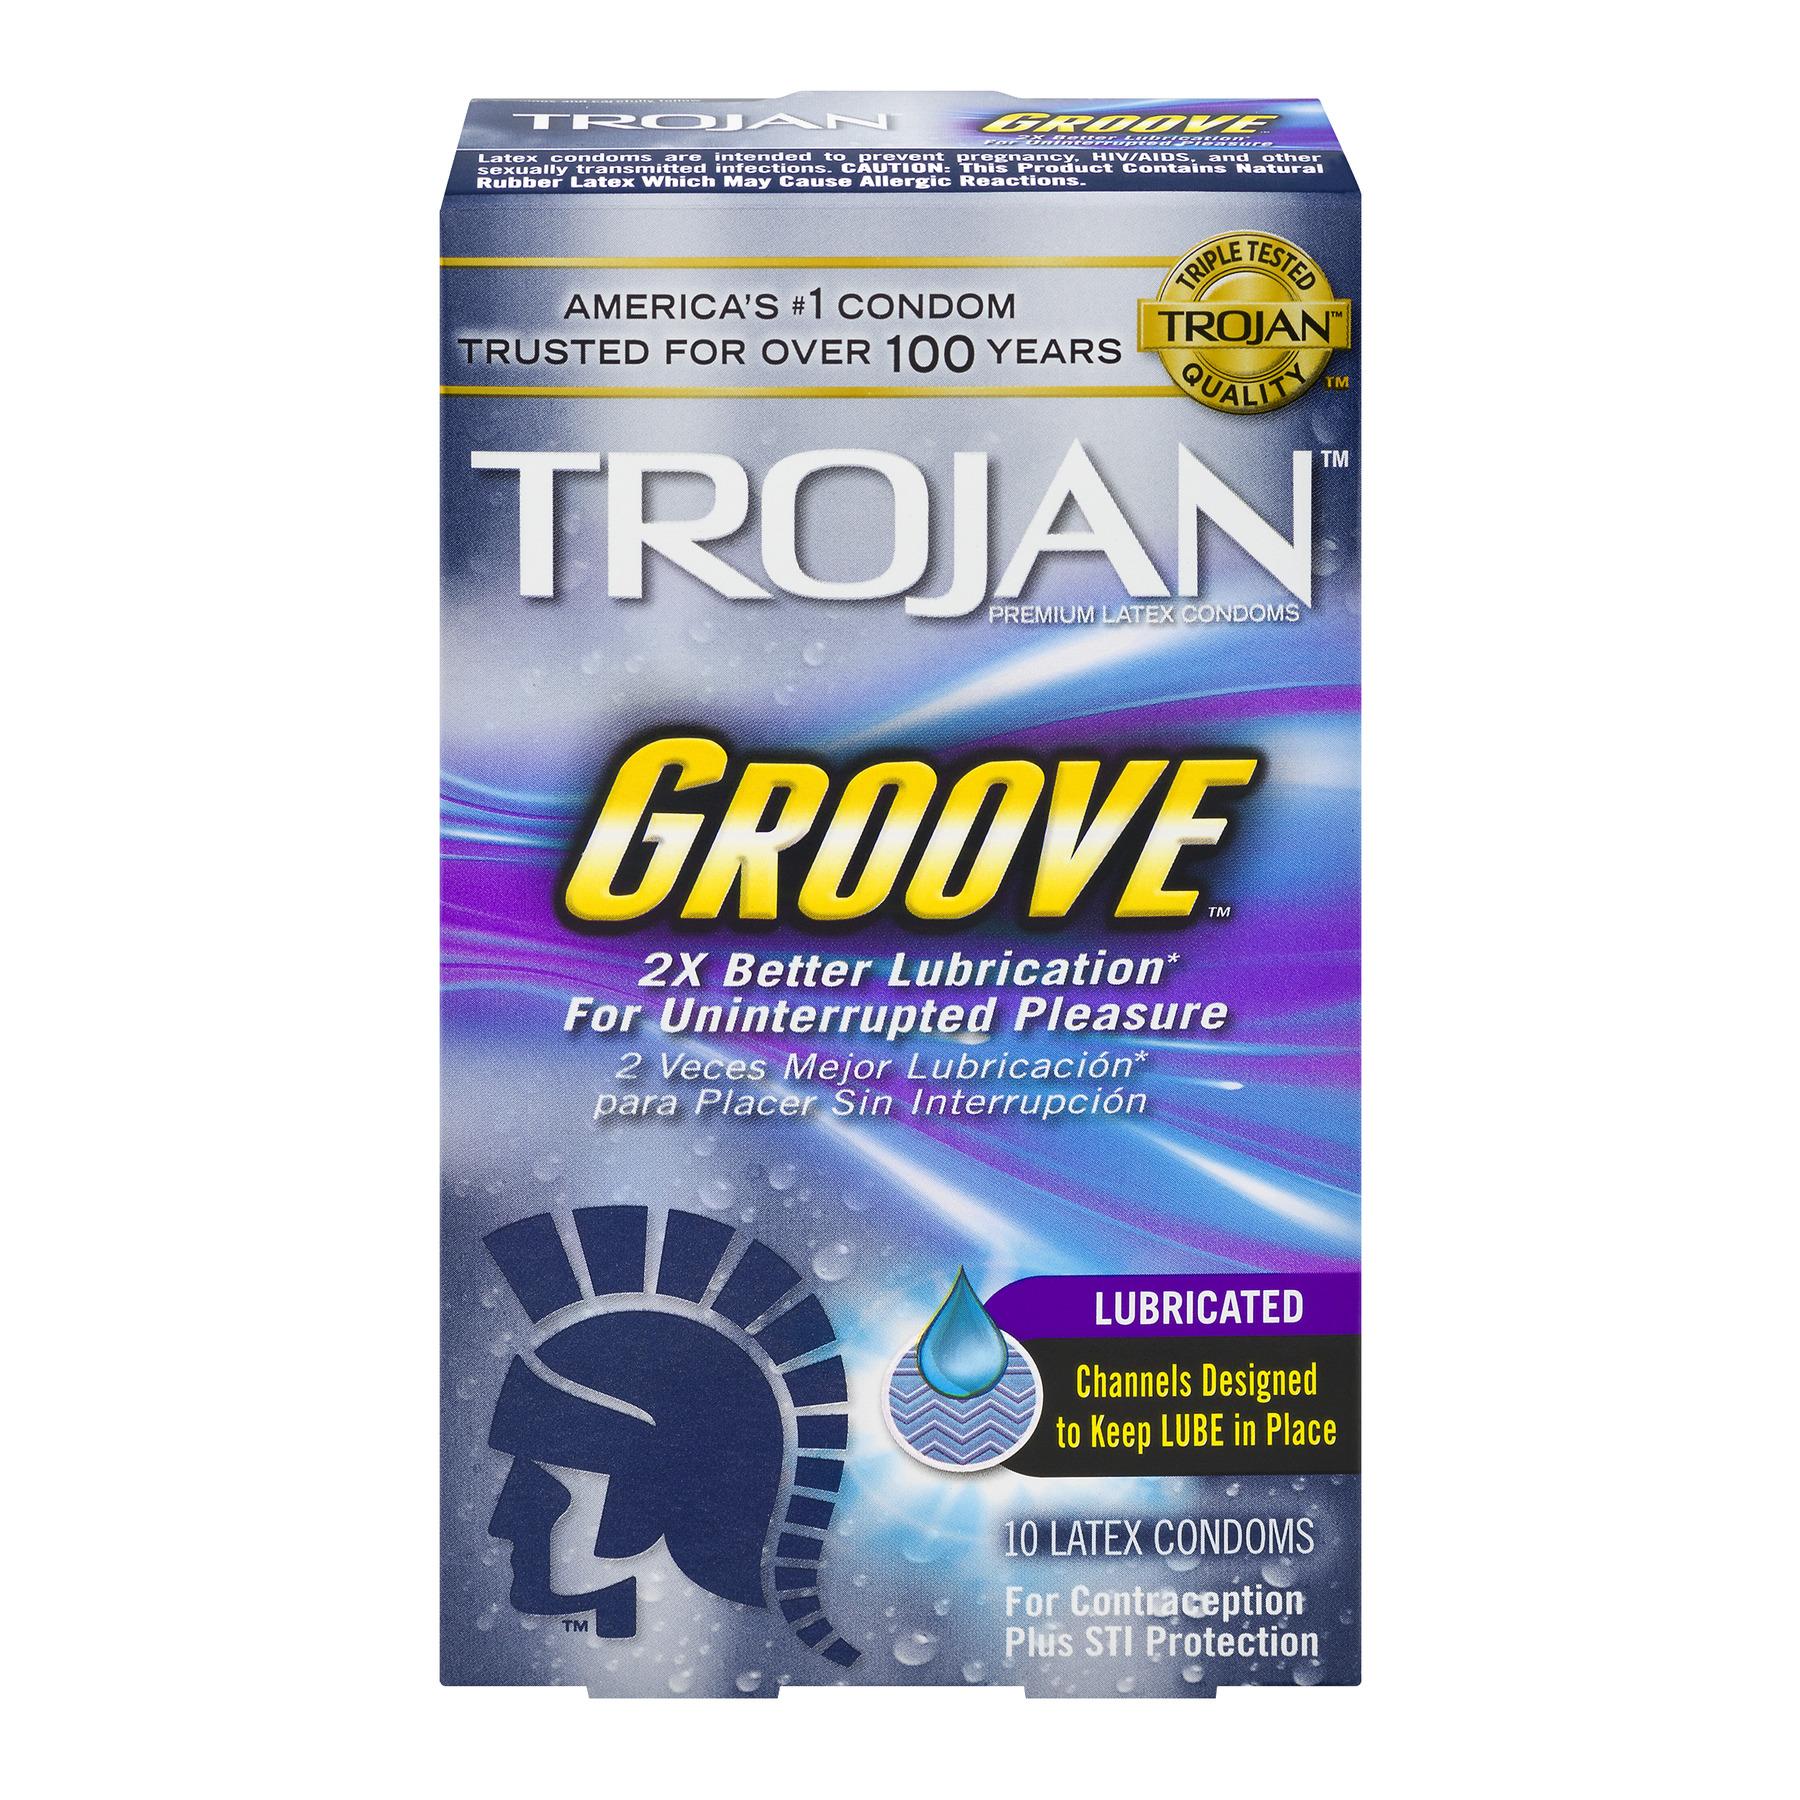 Trojan Groove Lubricated Latex Condoms - 10 ct